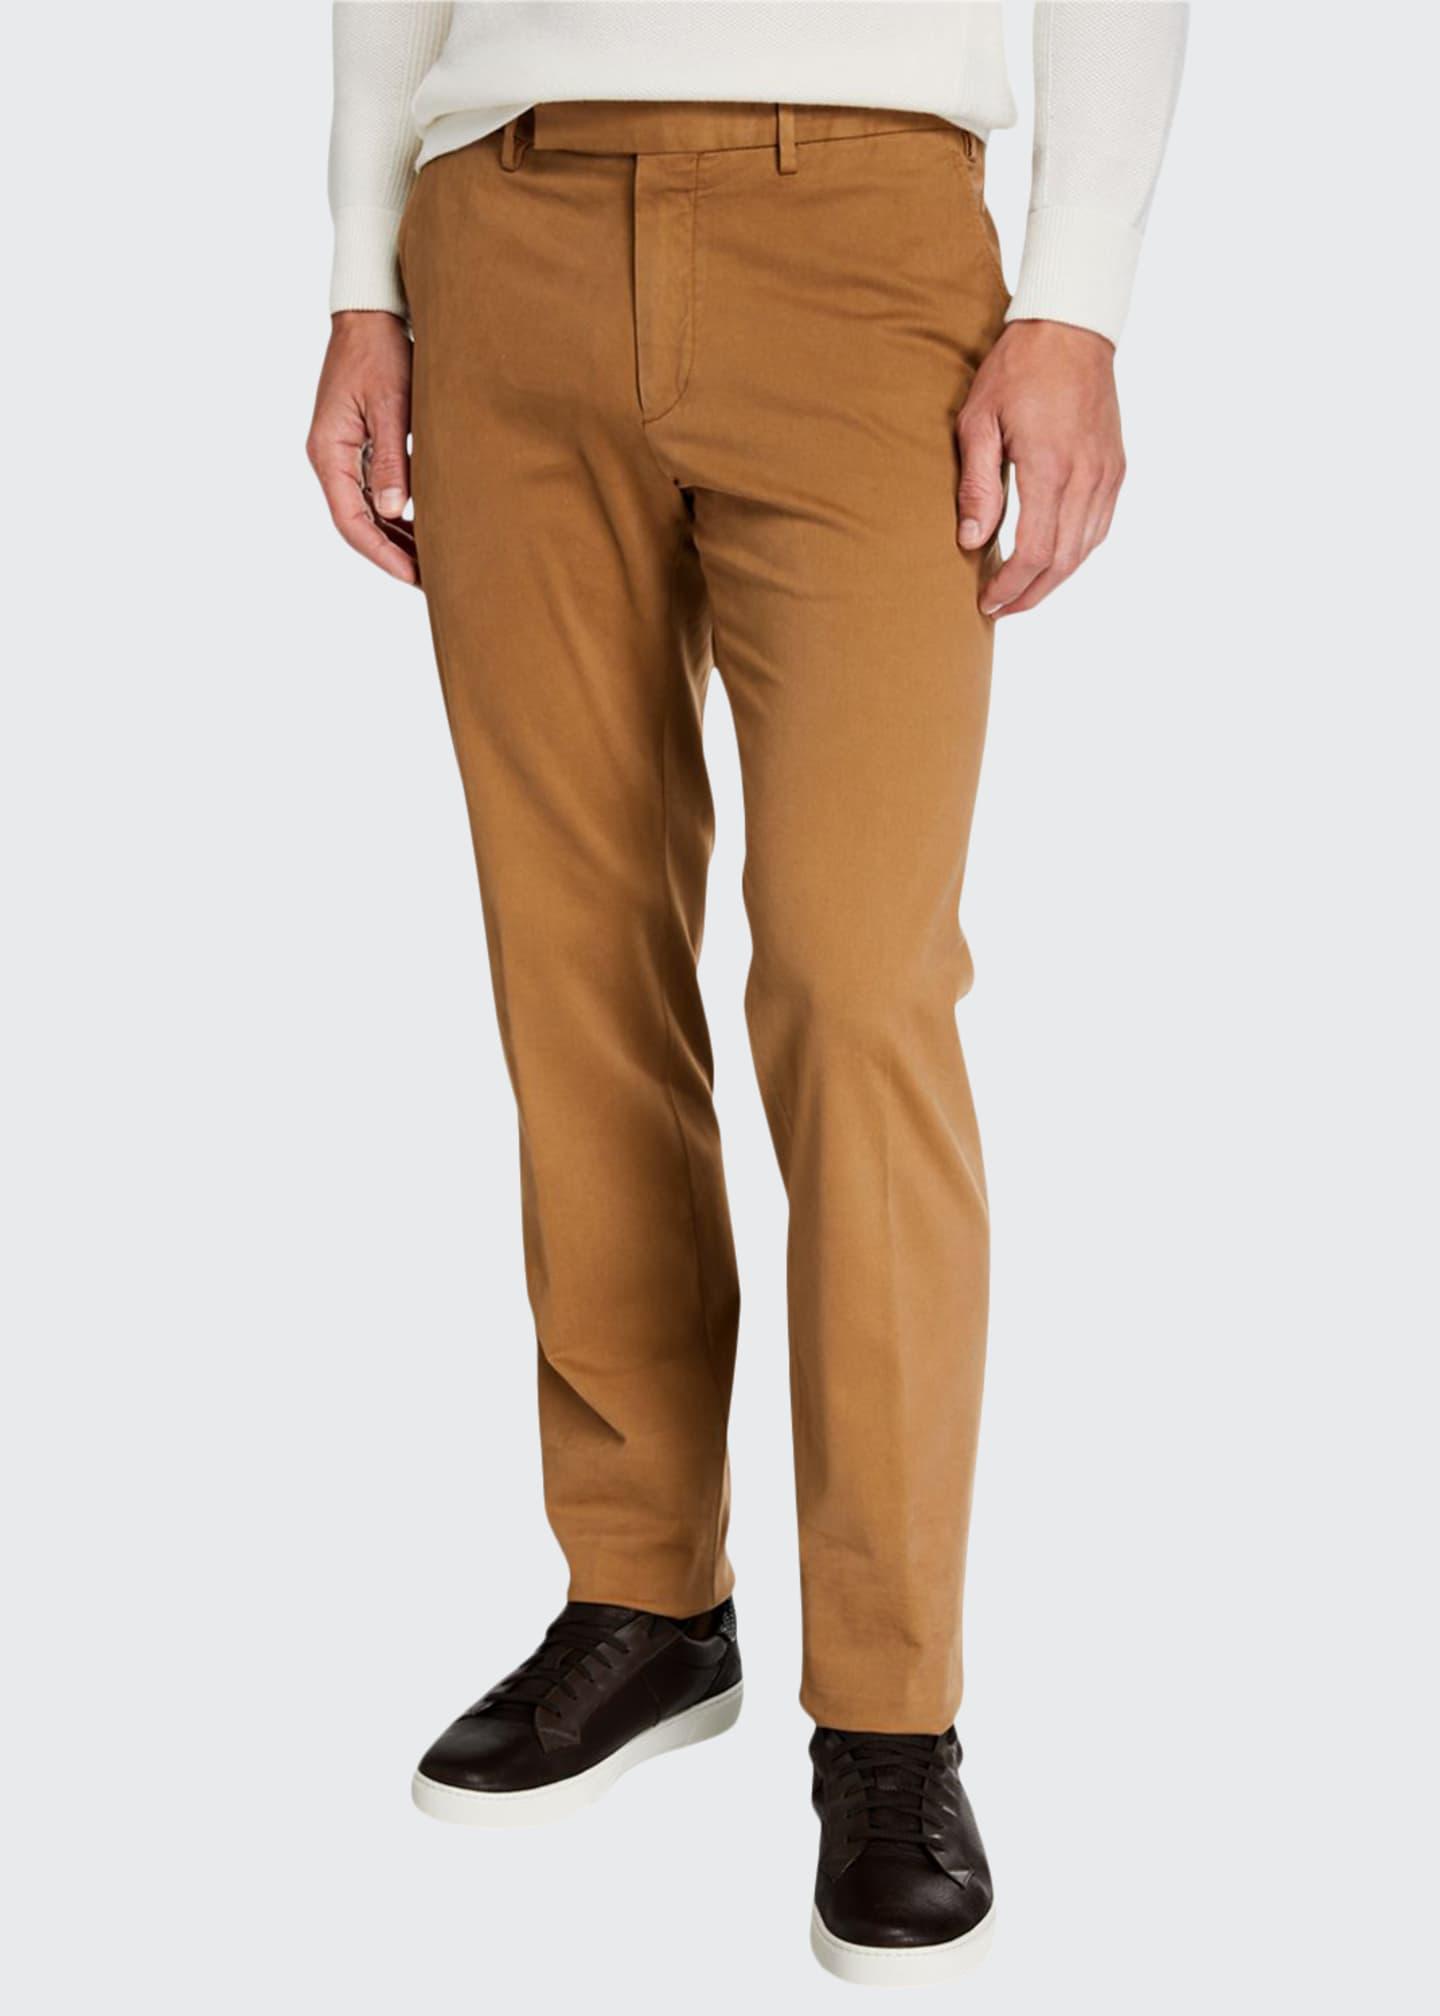 Ermenegildo Zegna Men's Garment-Dyed Tab Twill Pants